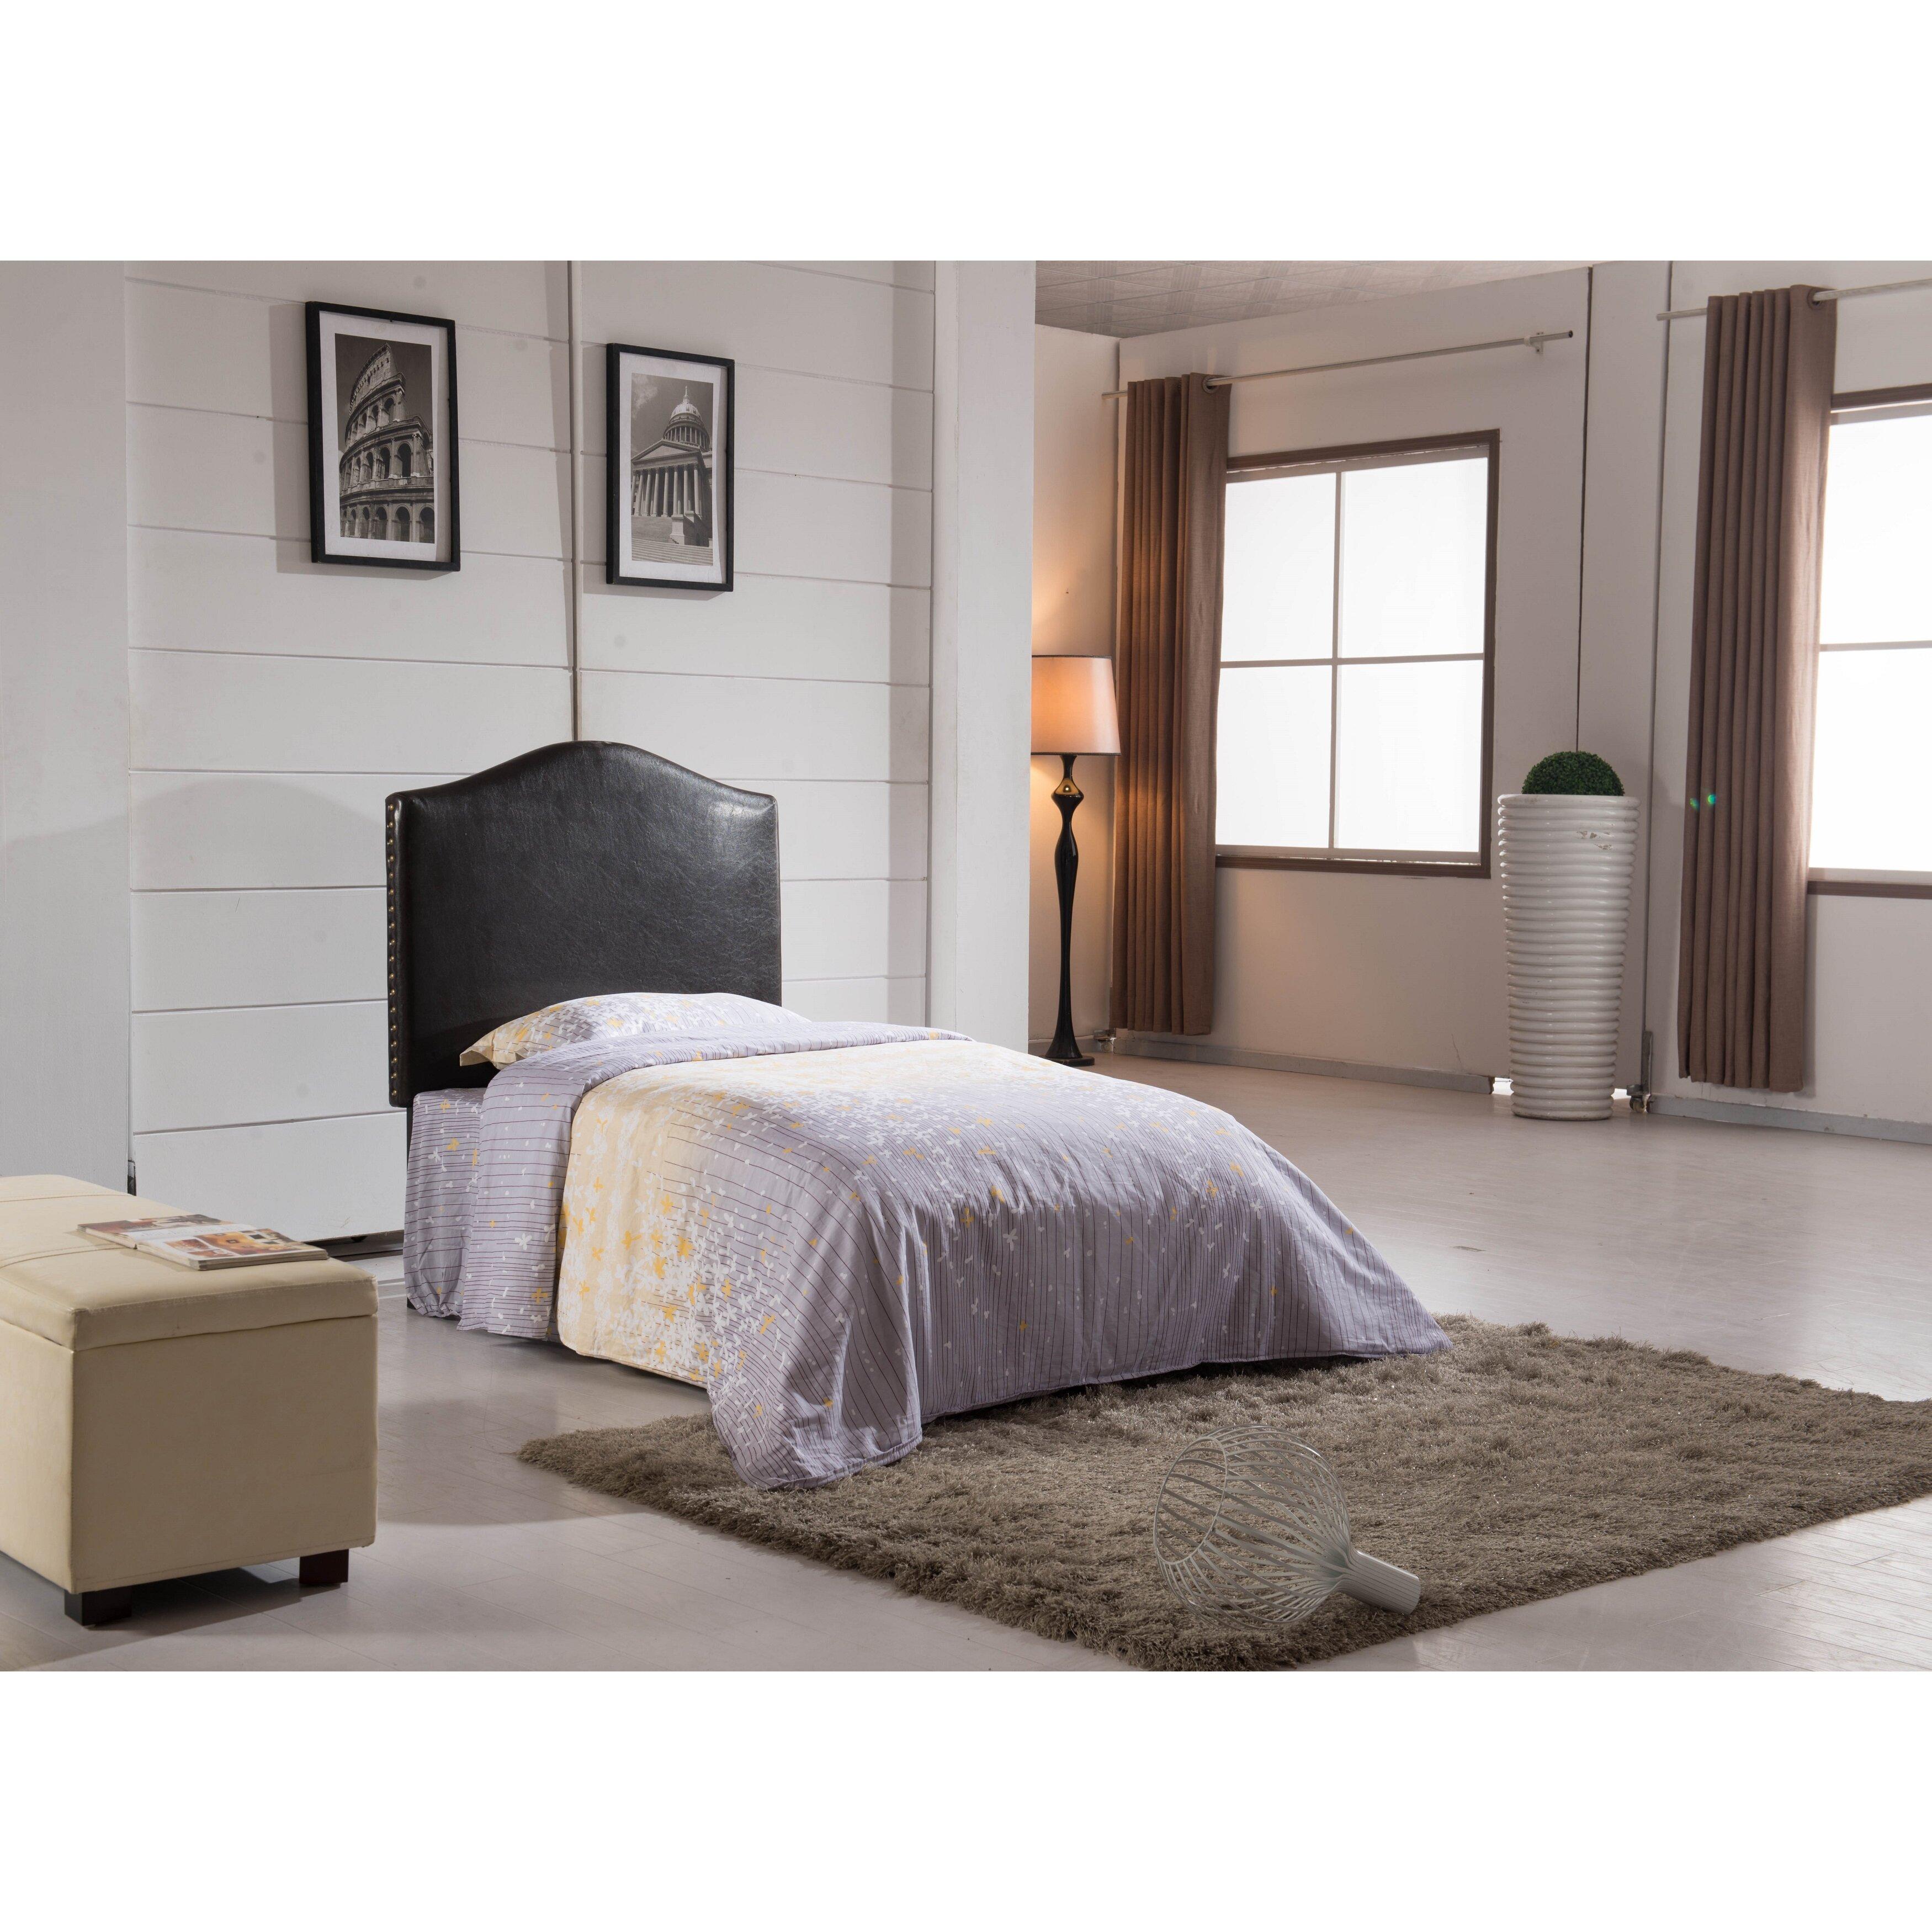 Noya Usa Castilian Upholstered Storage Bedroom Bench: NOYA USA Classic Twin Upholstered Headboard & Reviews